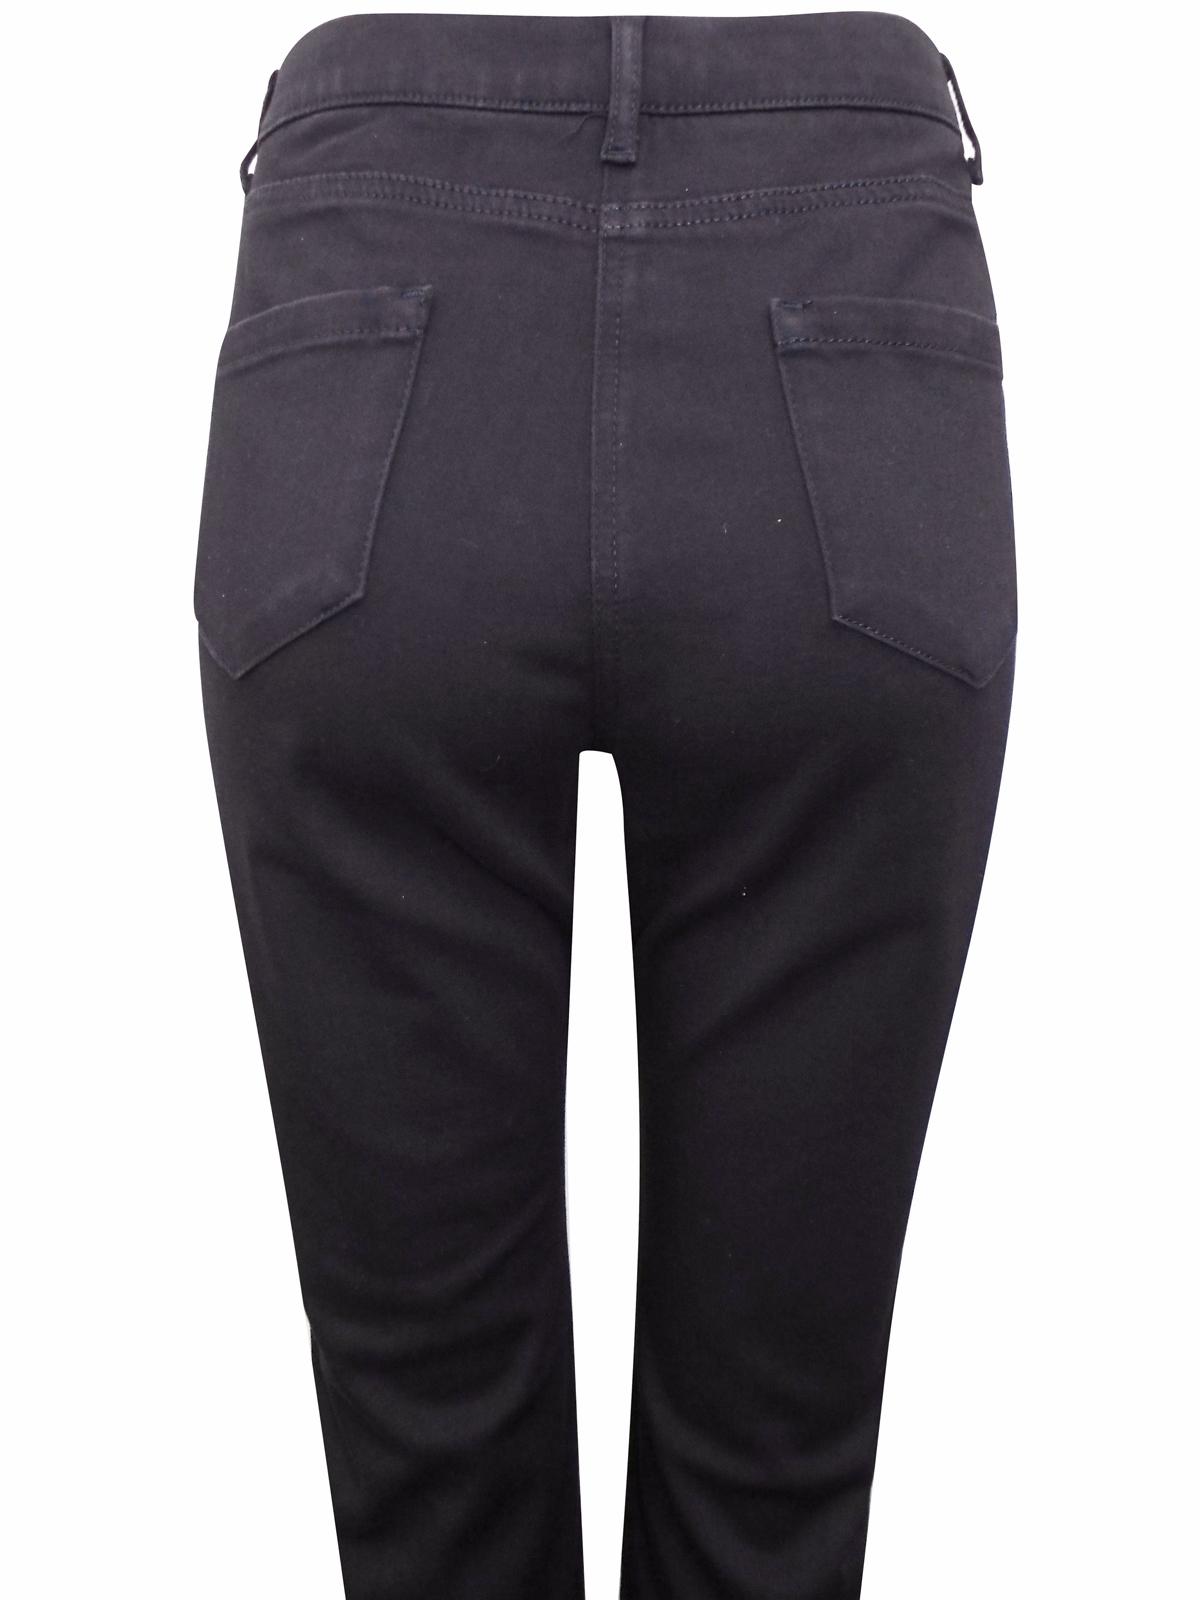 M/&S PER UNA Zipped Pocket ROMA RISE Straight Leg Trousers  /'NAVY/'